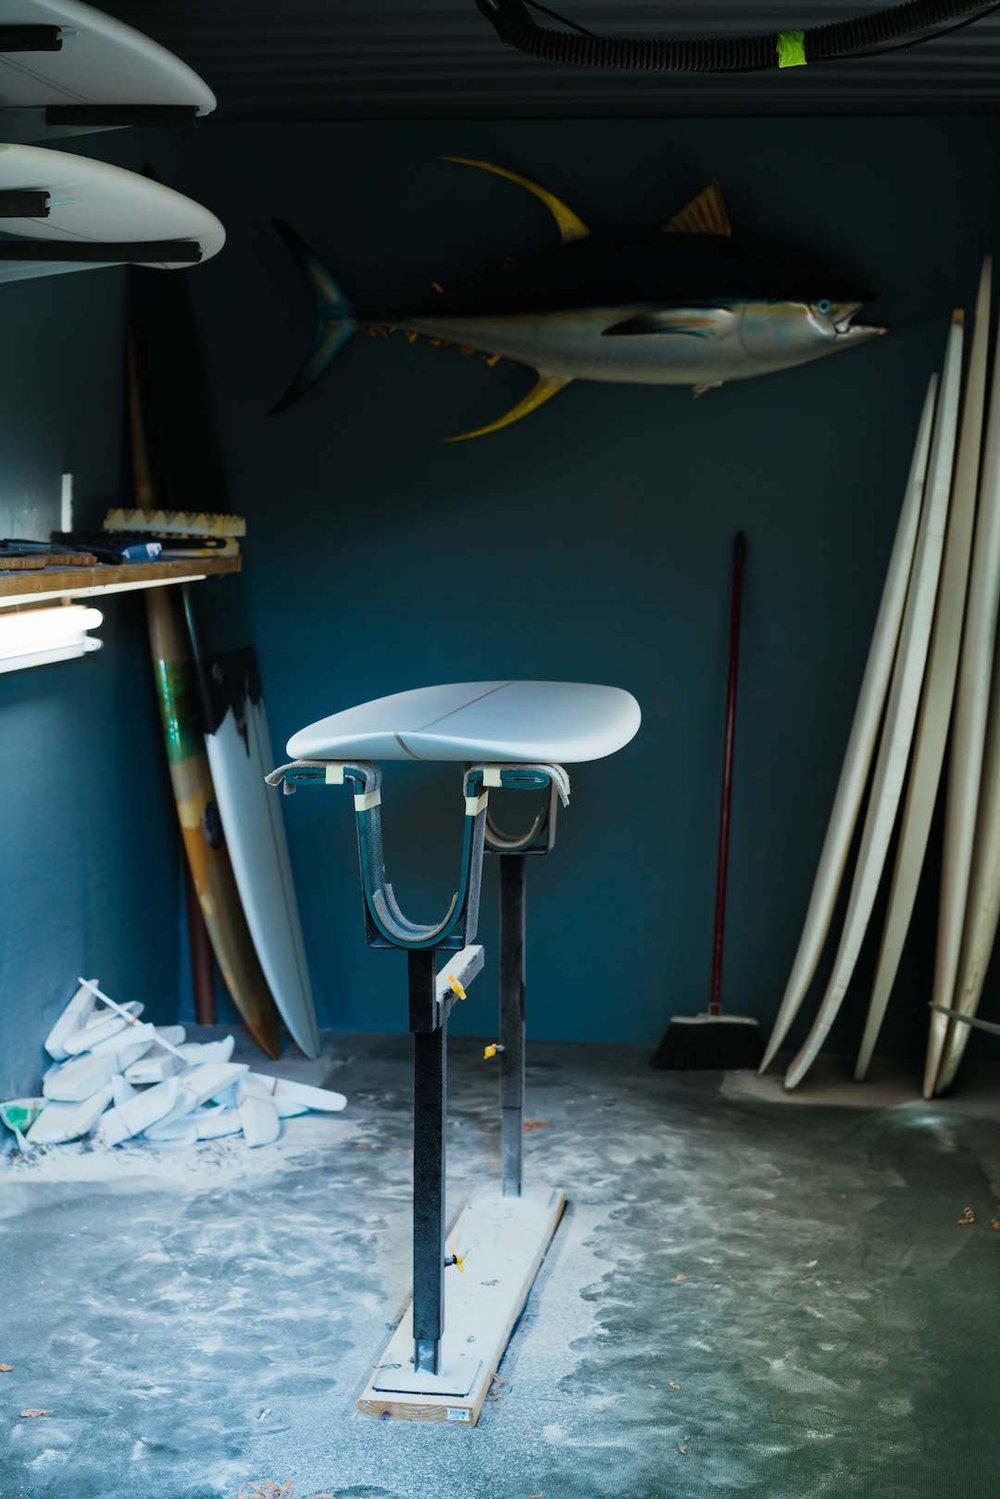 tyler-jorgenson-wax-surf-co-santana-social-club-menswear-sean-ryan-pierce-photography-surf-surfboard-surfing-made-in-america-8.jpg